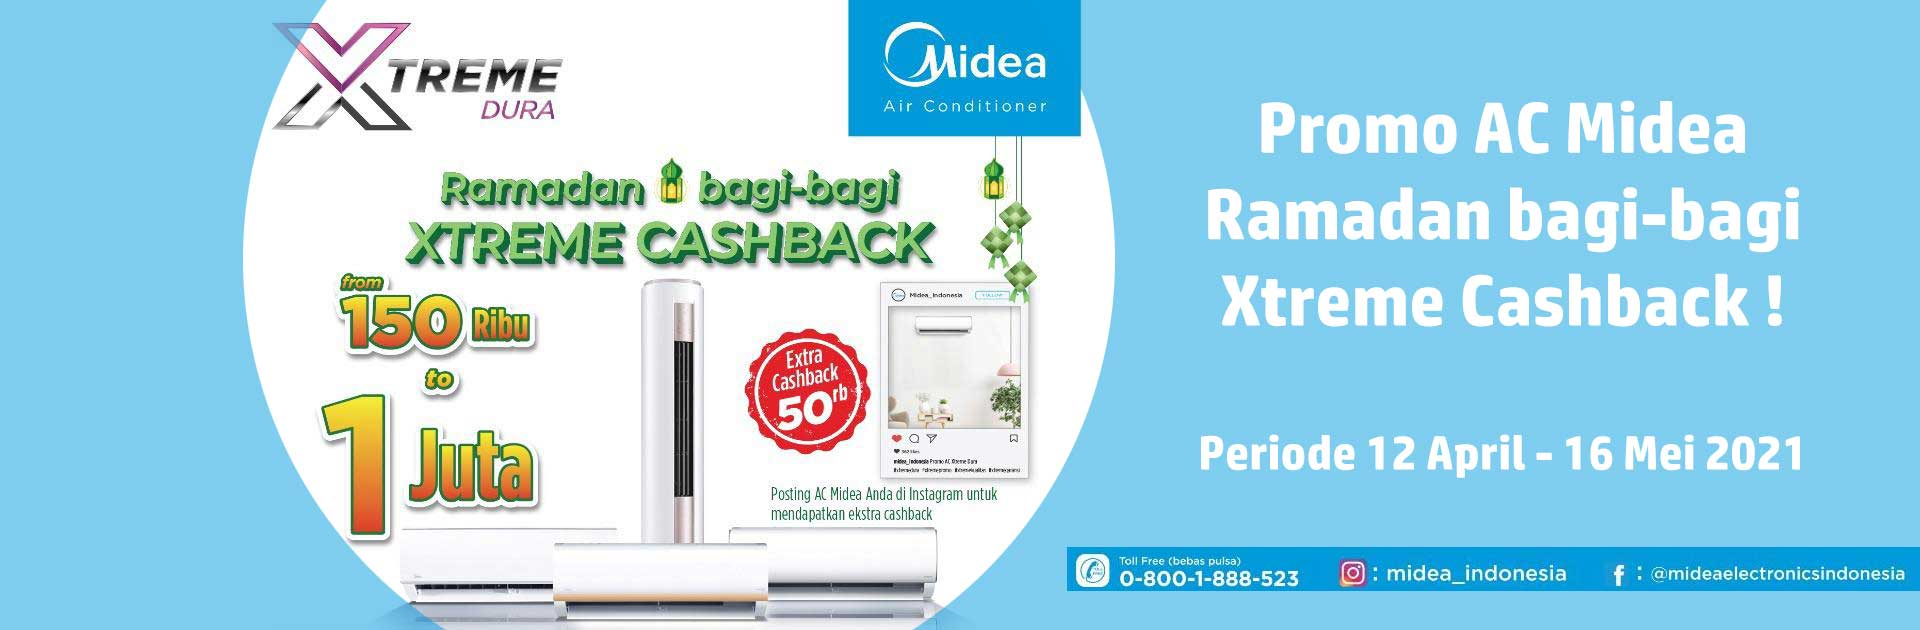 Promosi AC Midea Ramadan Bagi-Bagi XTREME Cashback